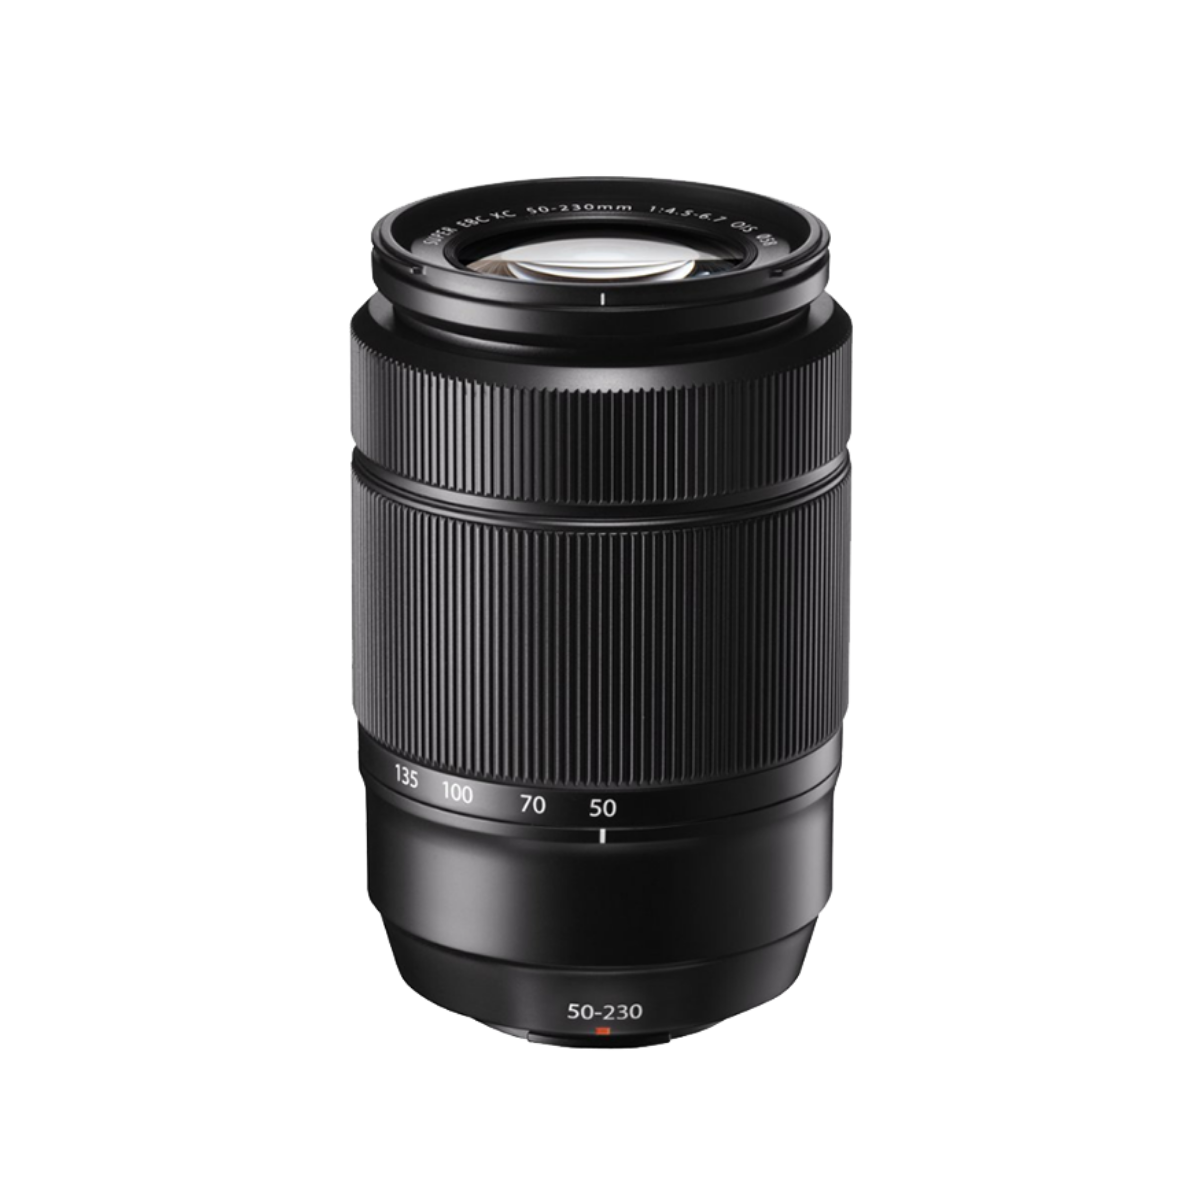 Fujifilm FUJINON XC 50-230mm F4.5-6.7 OIS II Lens Black